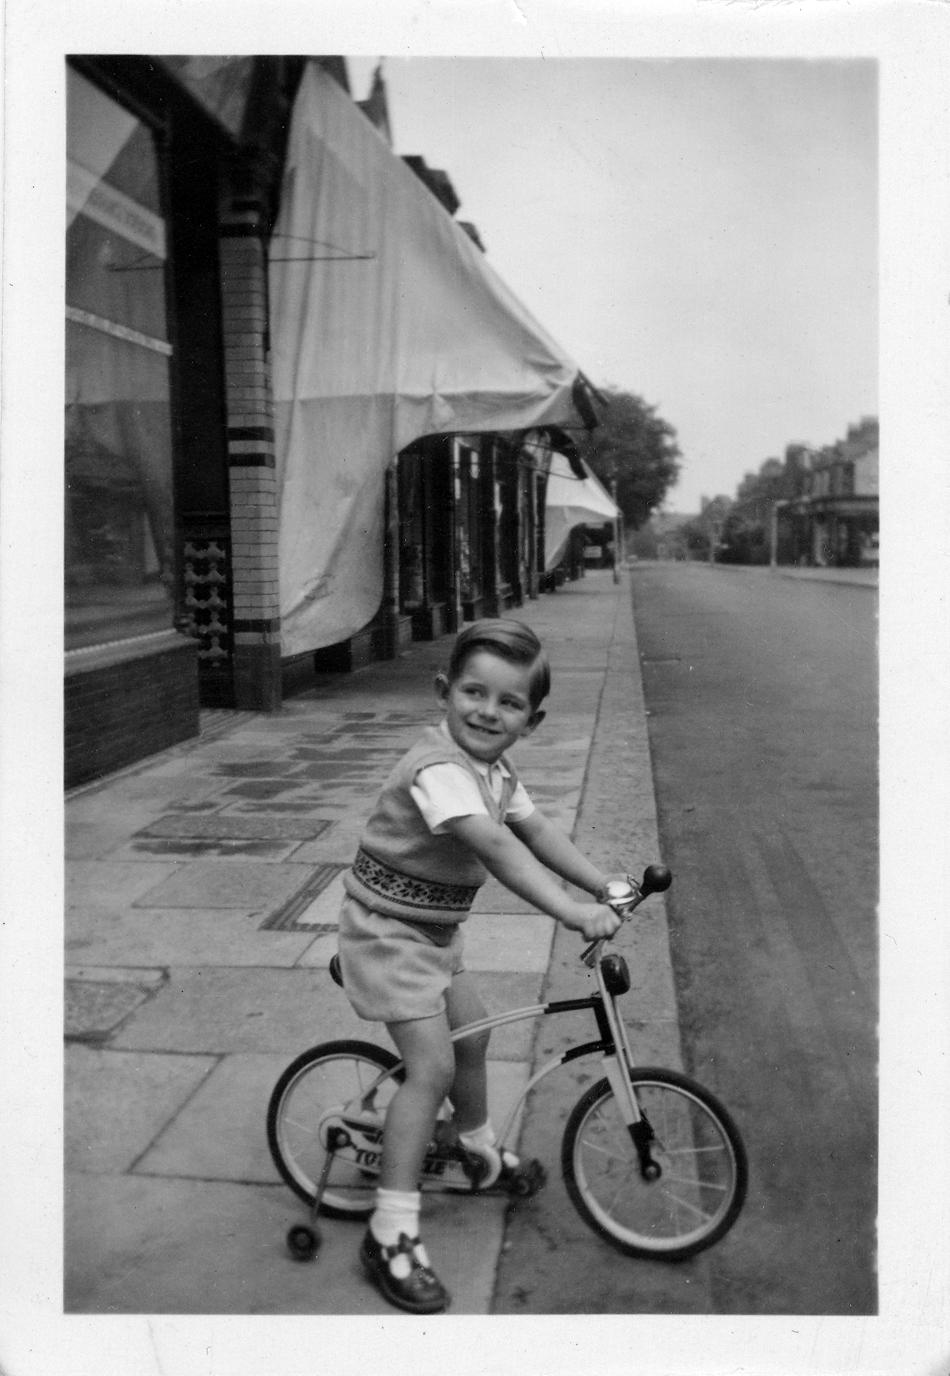 bike- myddleton rd circa 1952-3.jpg